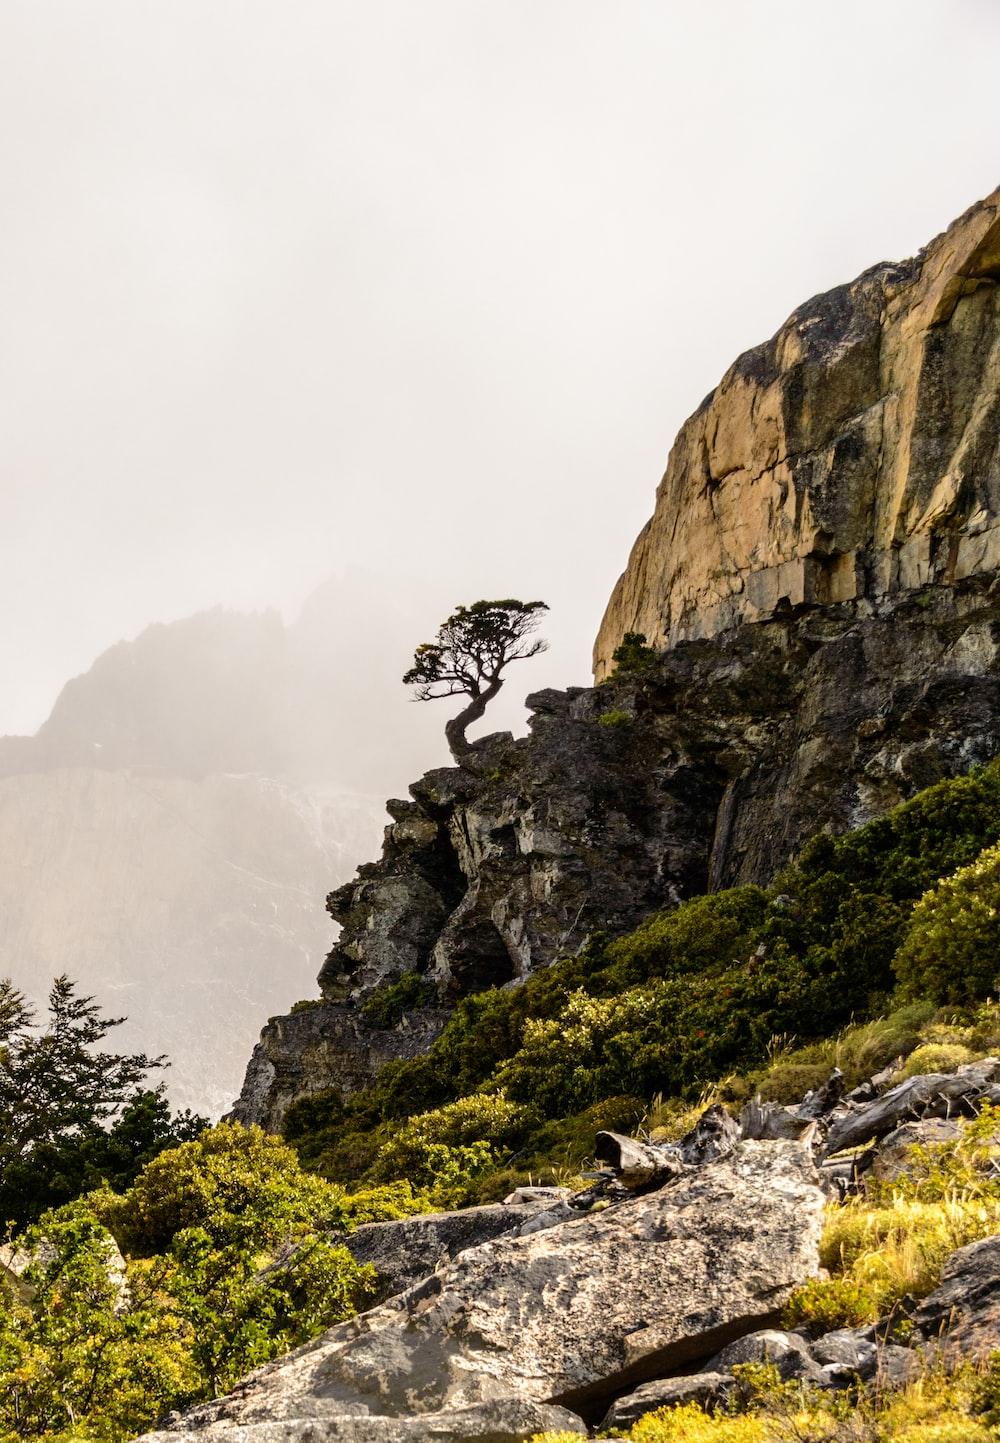 tree on cliff